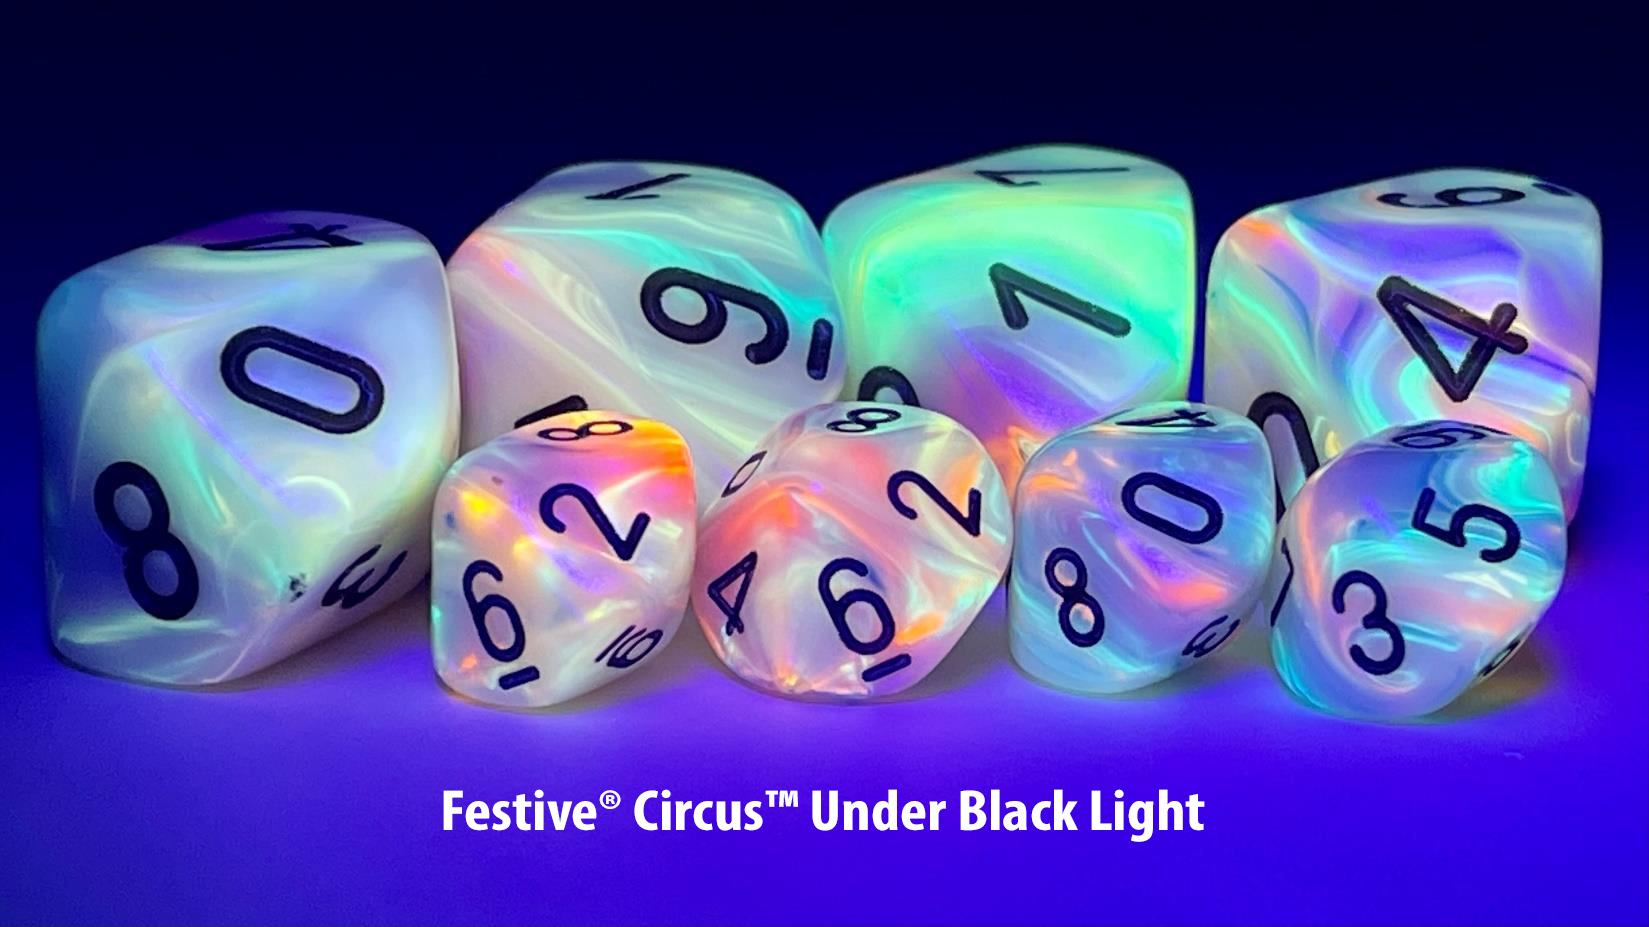 Festive Circus